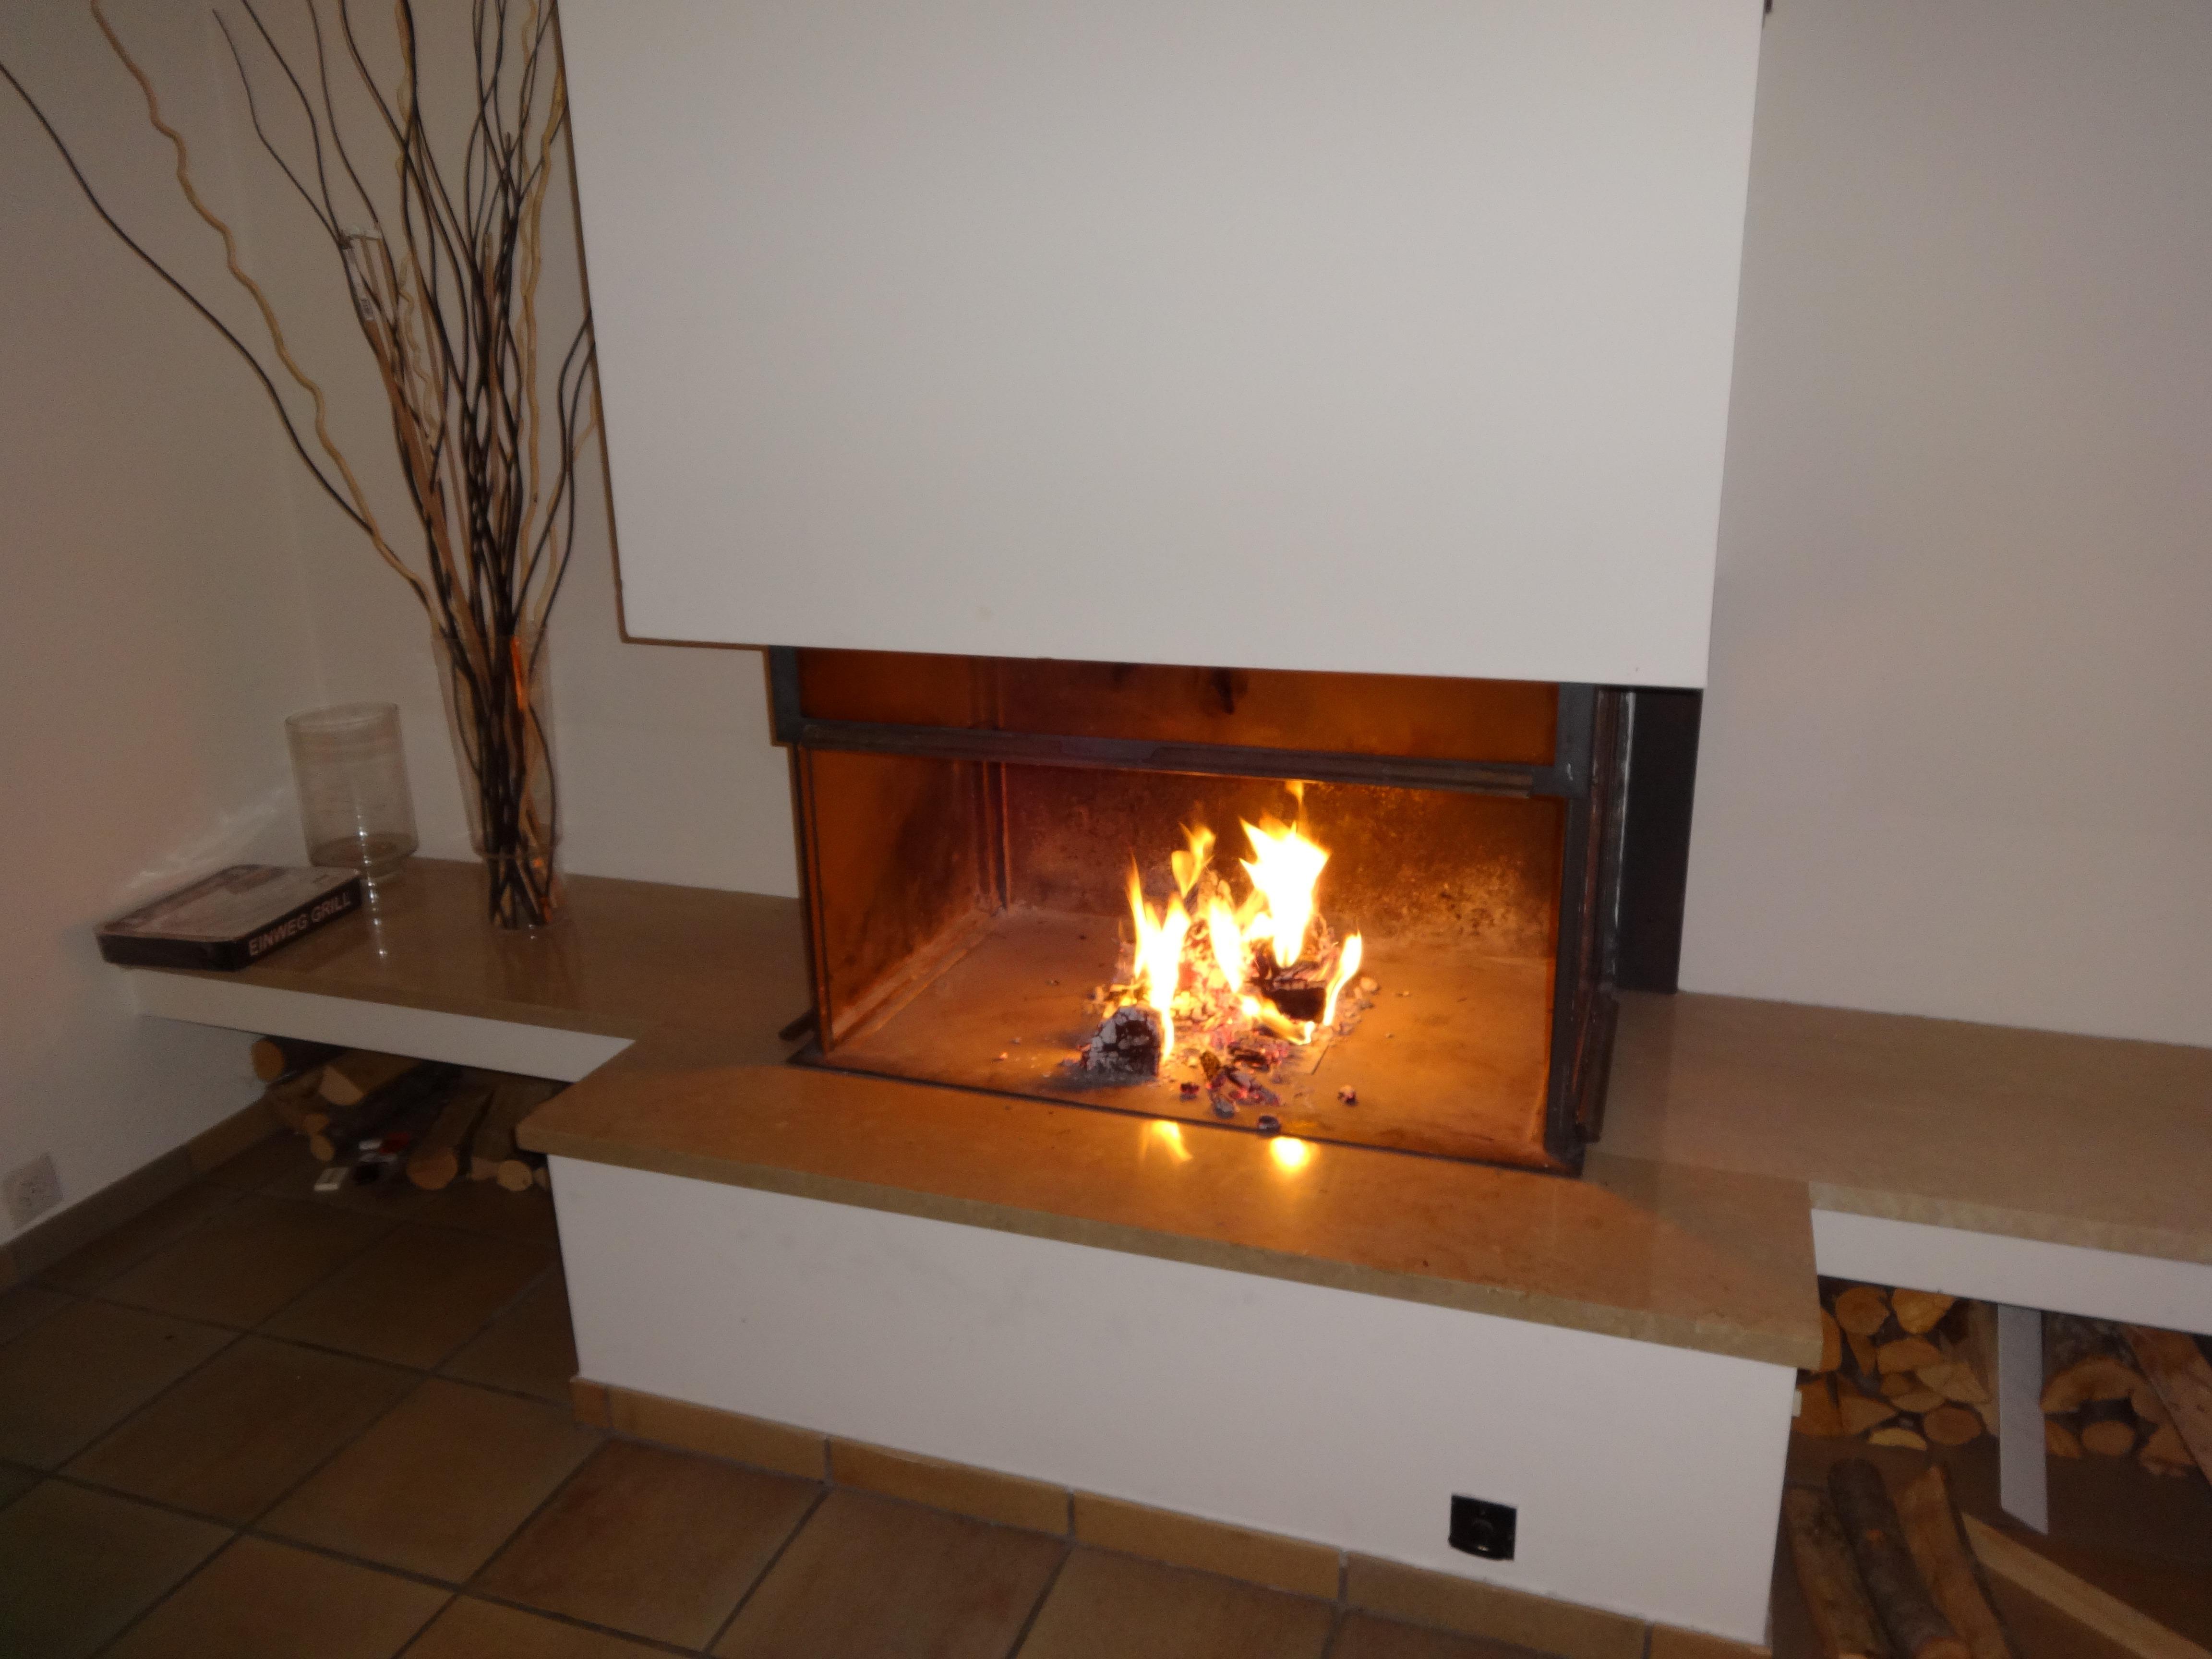 kostenlose foto holz stock kamin zimmer hitze. Black Bedroom Furniture Sets. Home Design Ideas